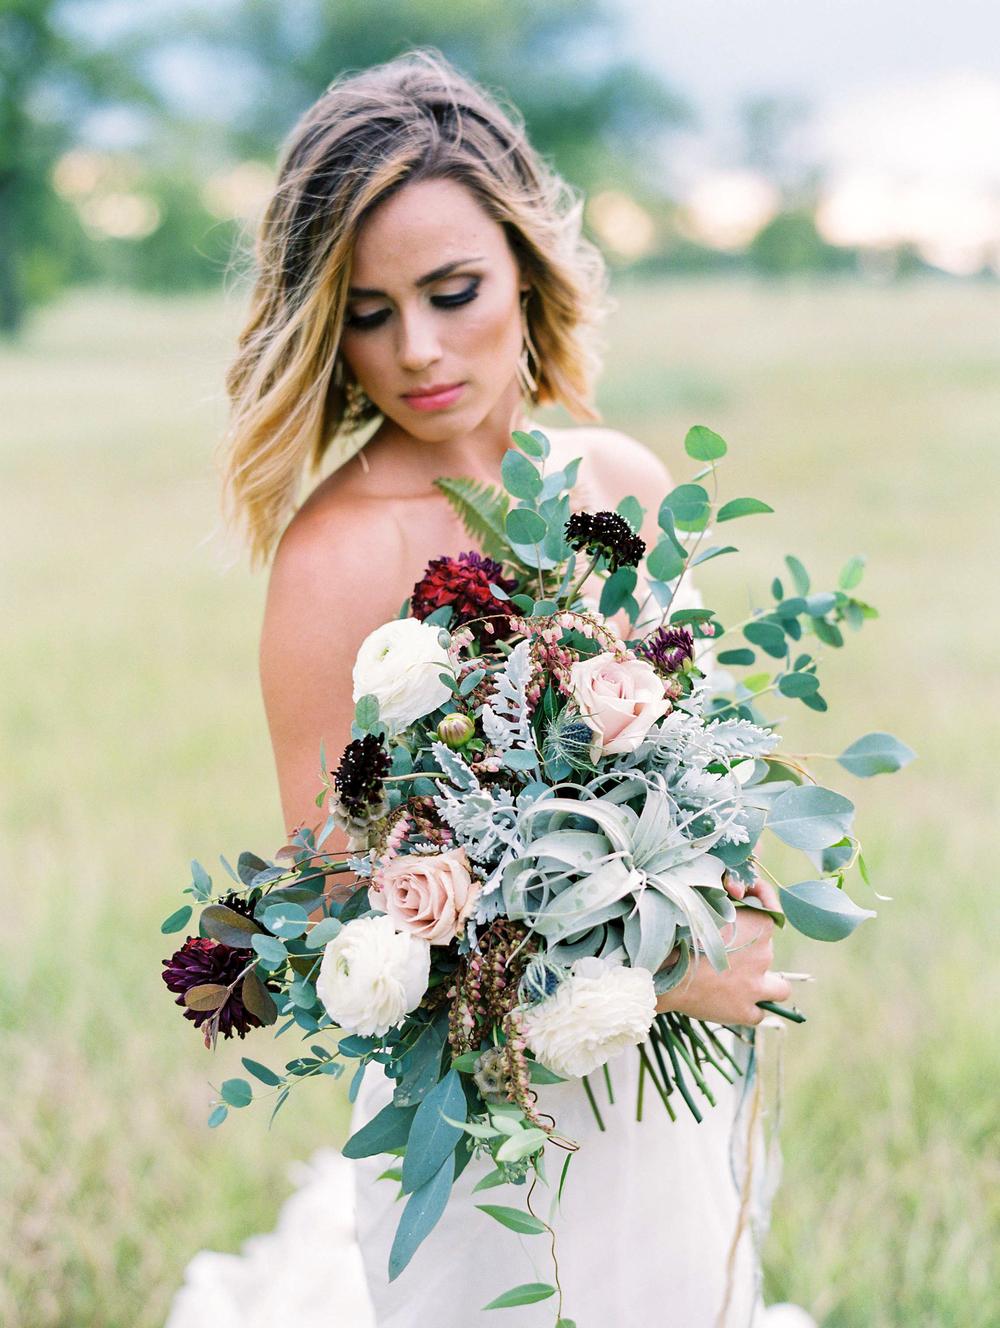 Dana-Fernandez-Photography-Houston-Wedding-Photographer-Film-100-Layer-Cake-Wedding-Inspiration-Destination-1.jpg